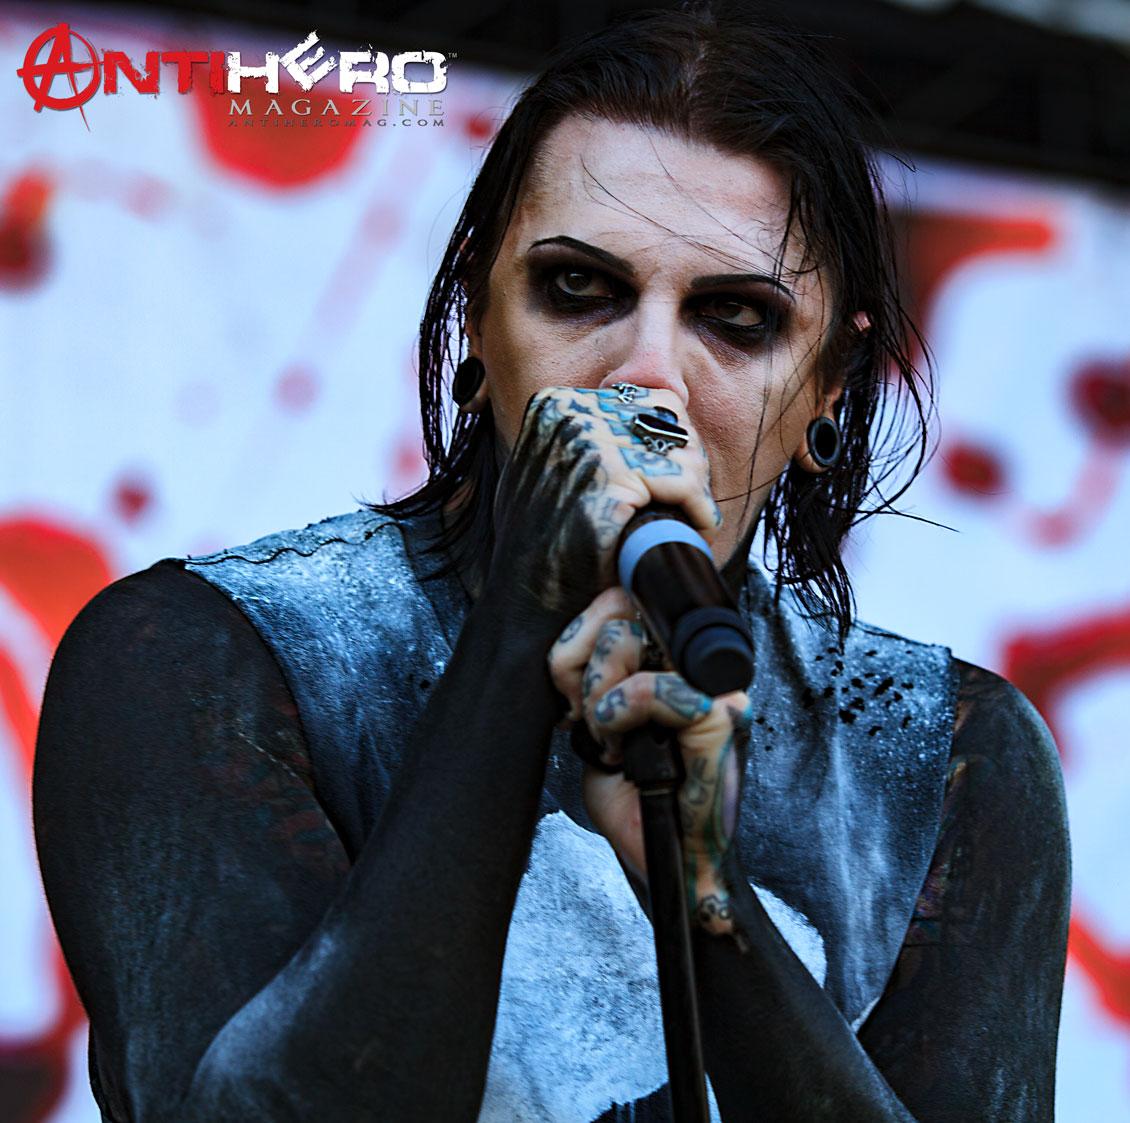 Ozzfest-Knotfest-2016_160925_1503